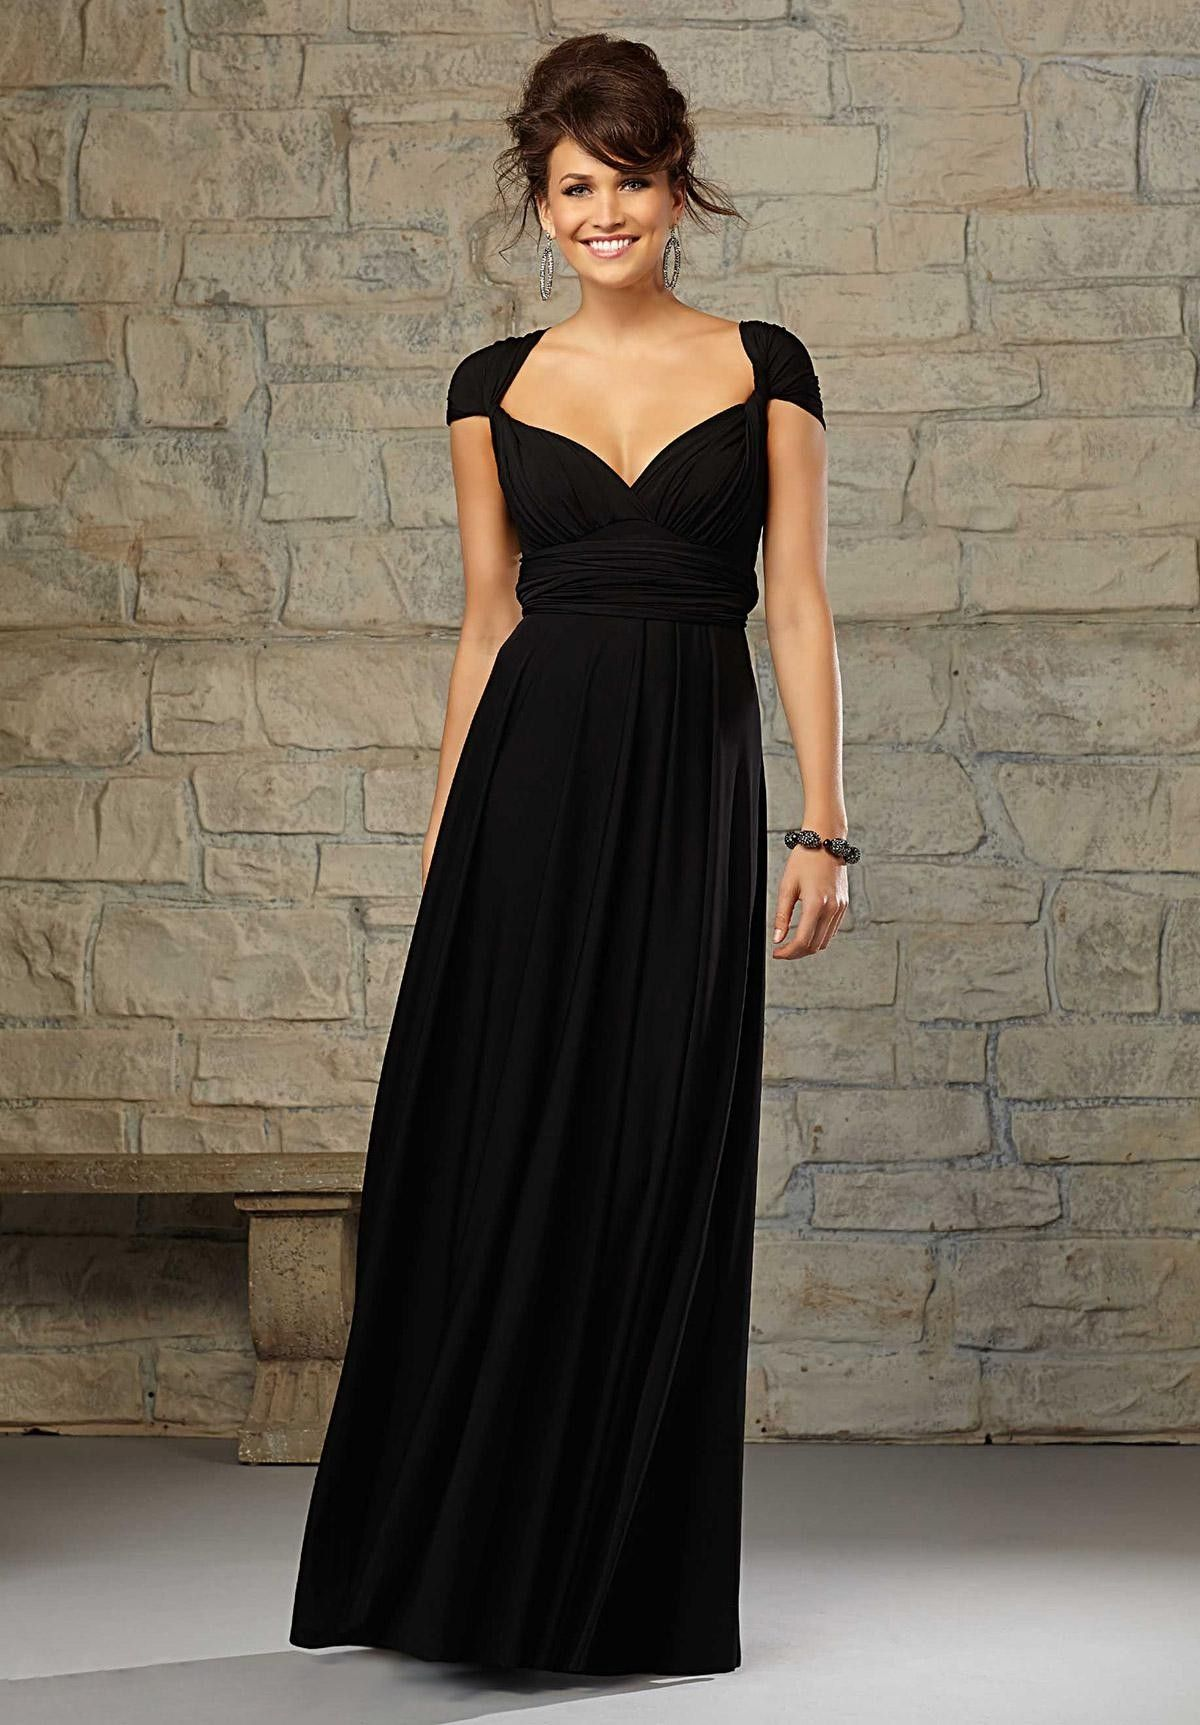 Elegant Black Bridesmaid Dresses Short Dress For